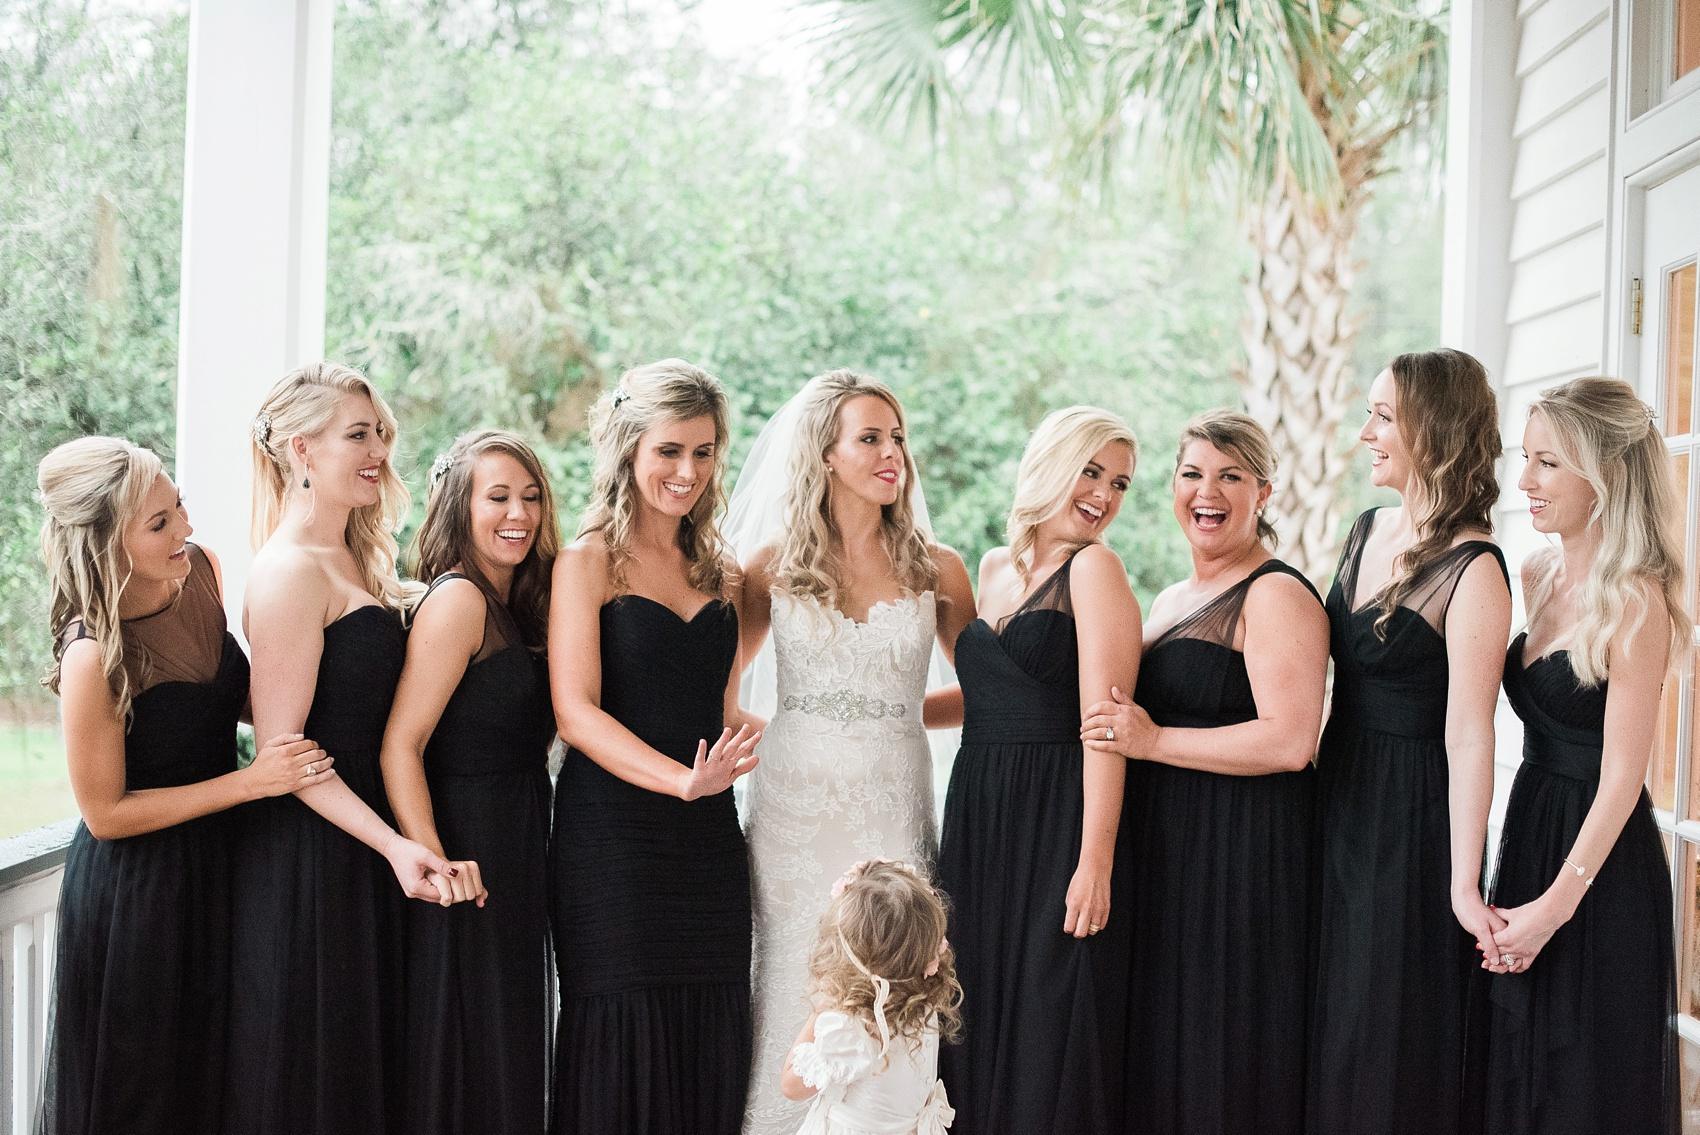 South_carolina_wedding_photographer_0049.jpg